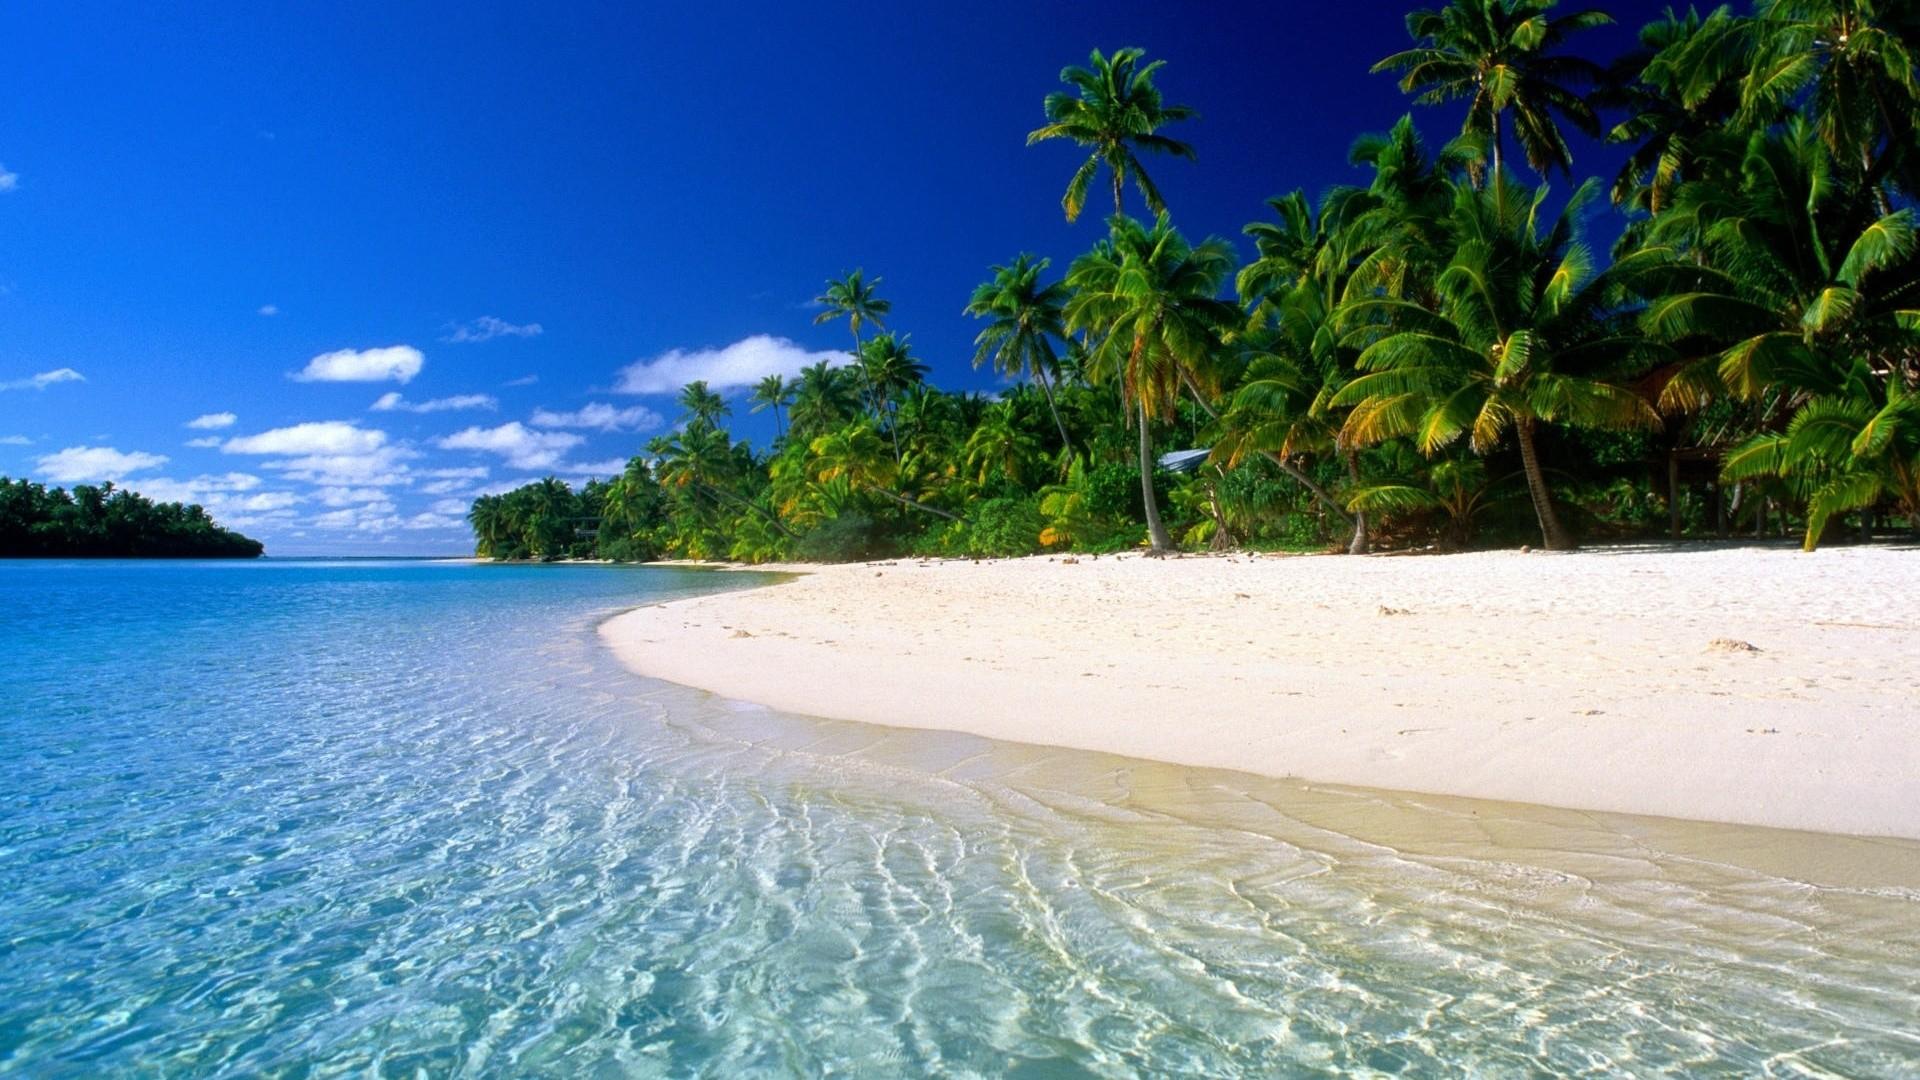 sfondi spiagge 63 immagini